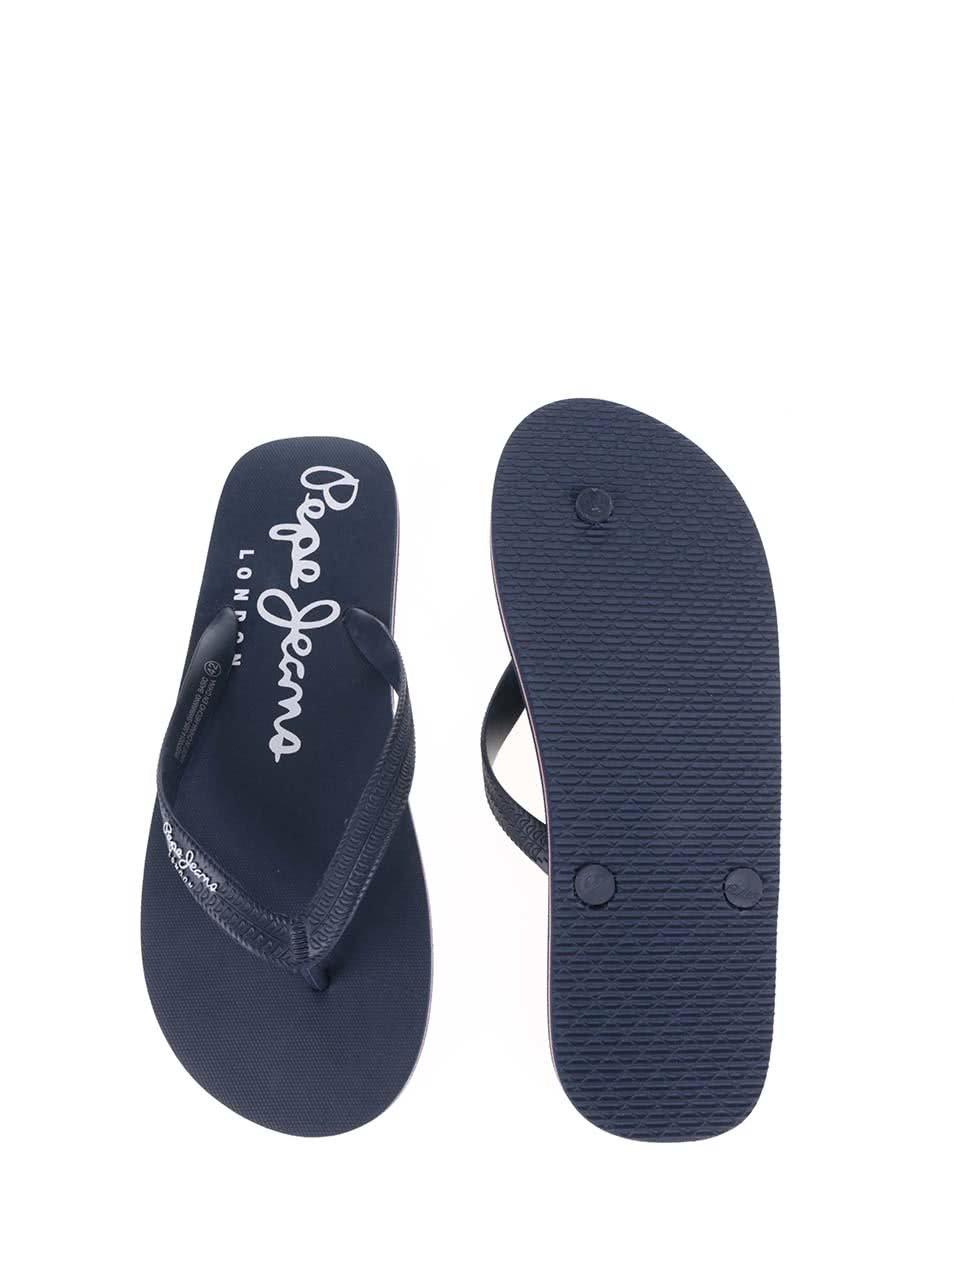 a5b4f86143bf Tmavomodré pánske žabky Pepe Jeans Swimming ...